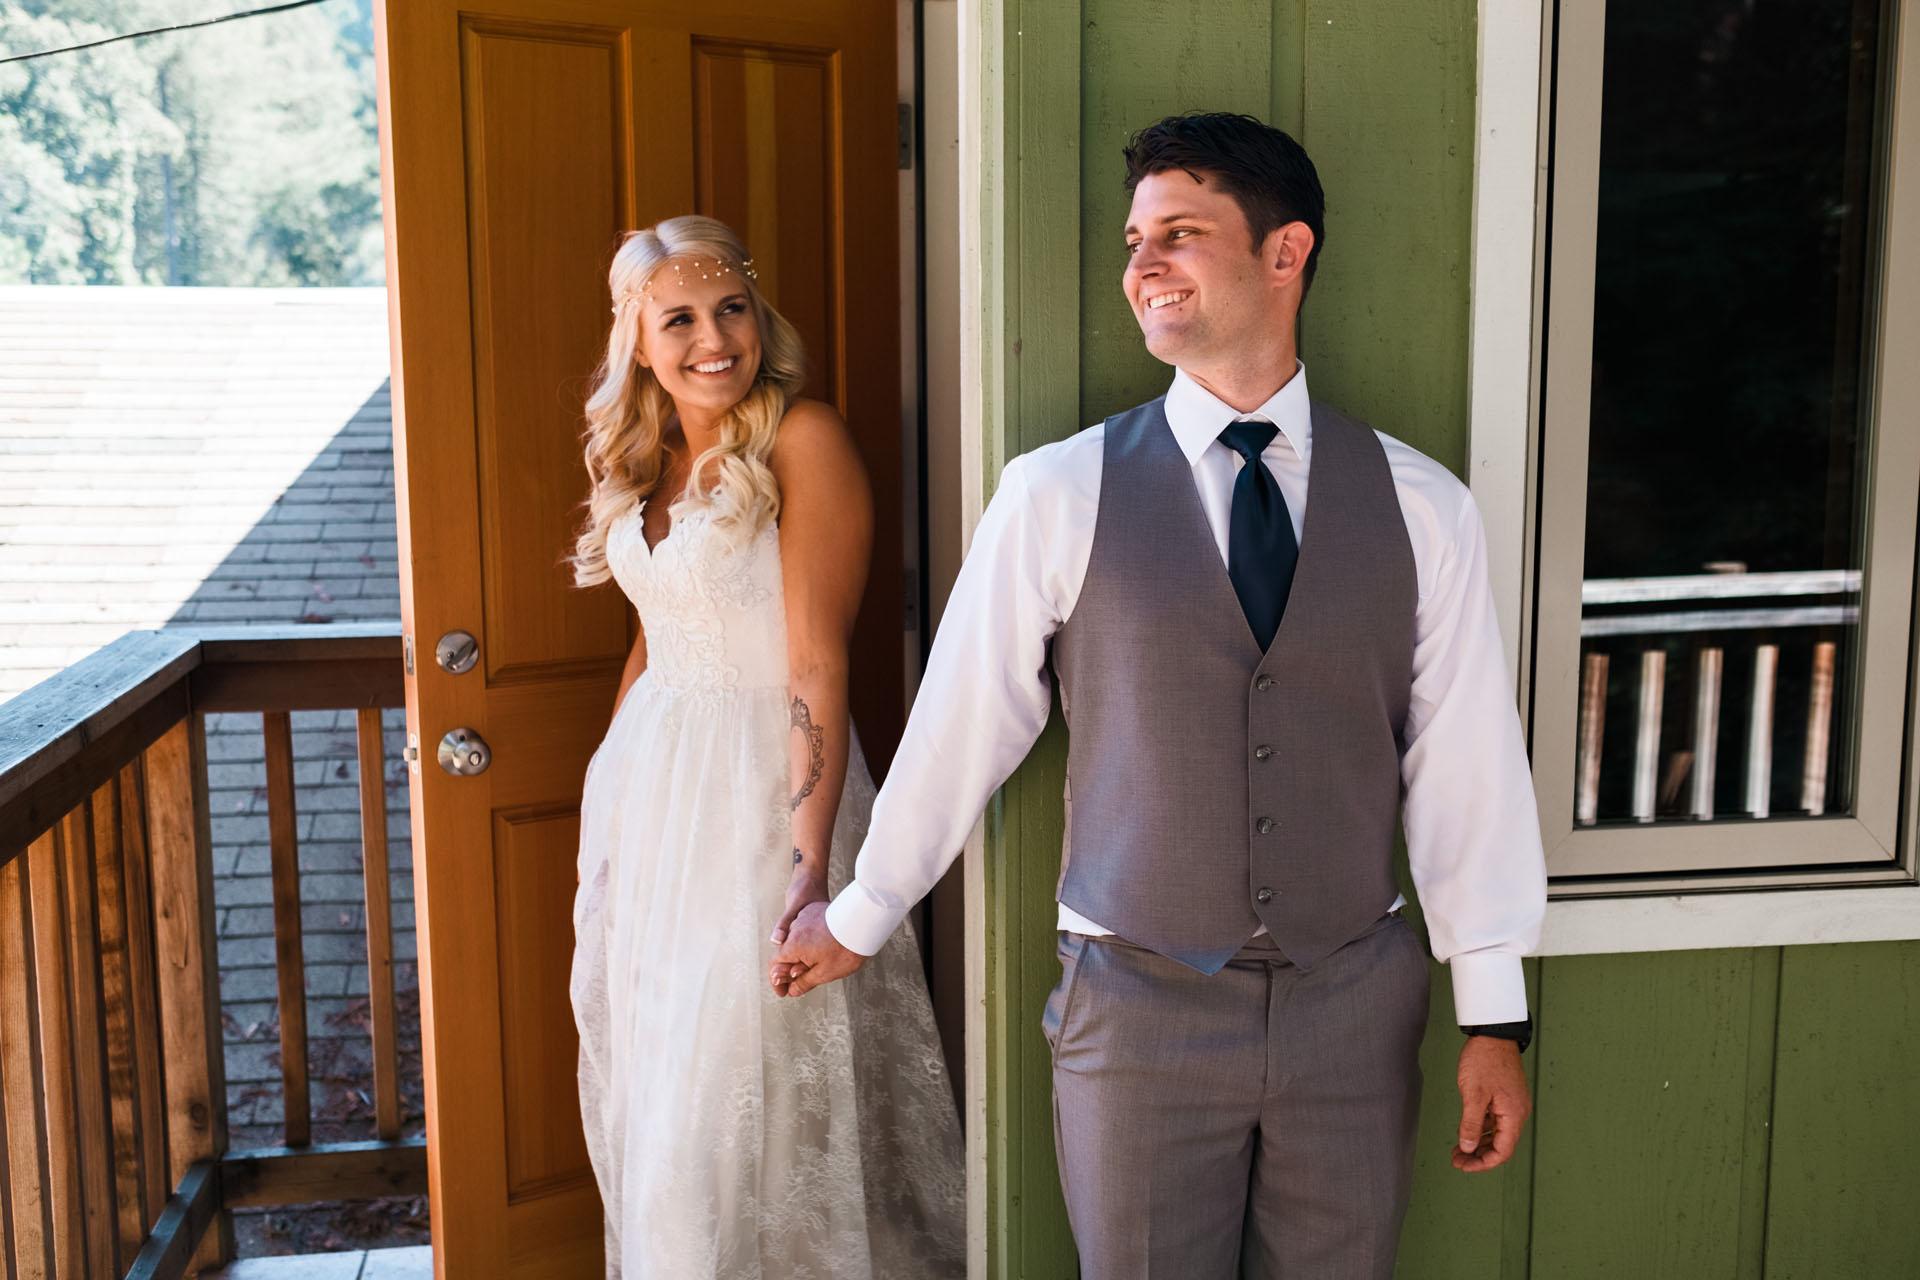 10-7-17 Devon and Jordan's Wedding-53.jpg